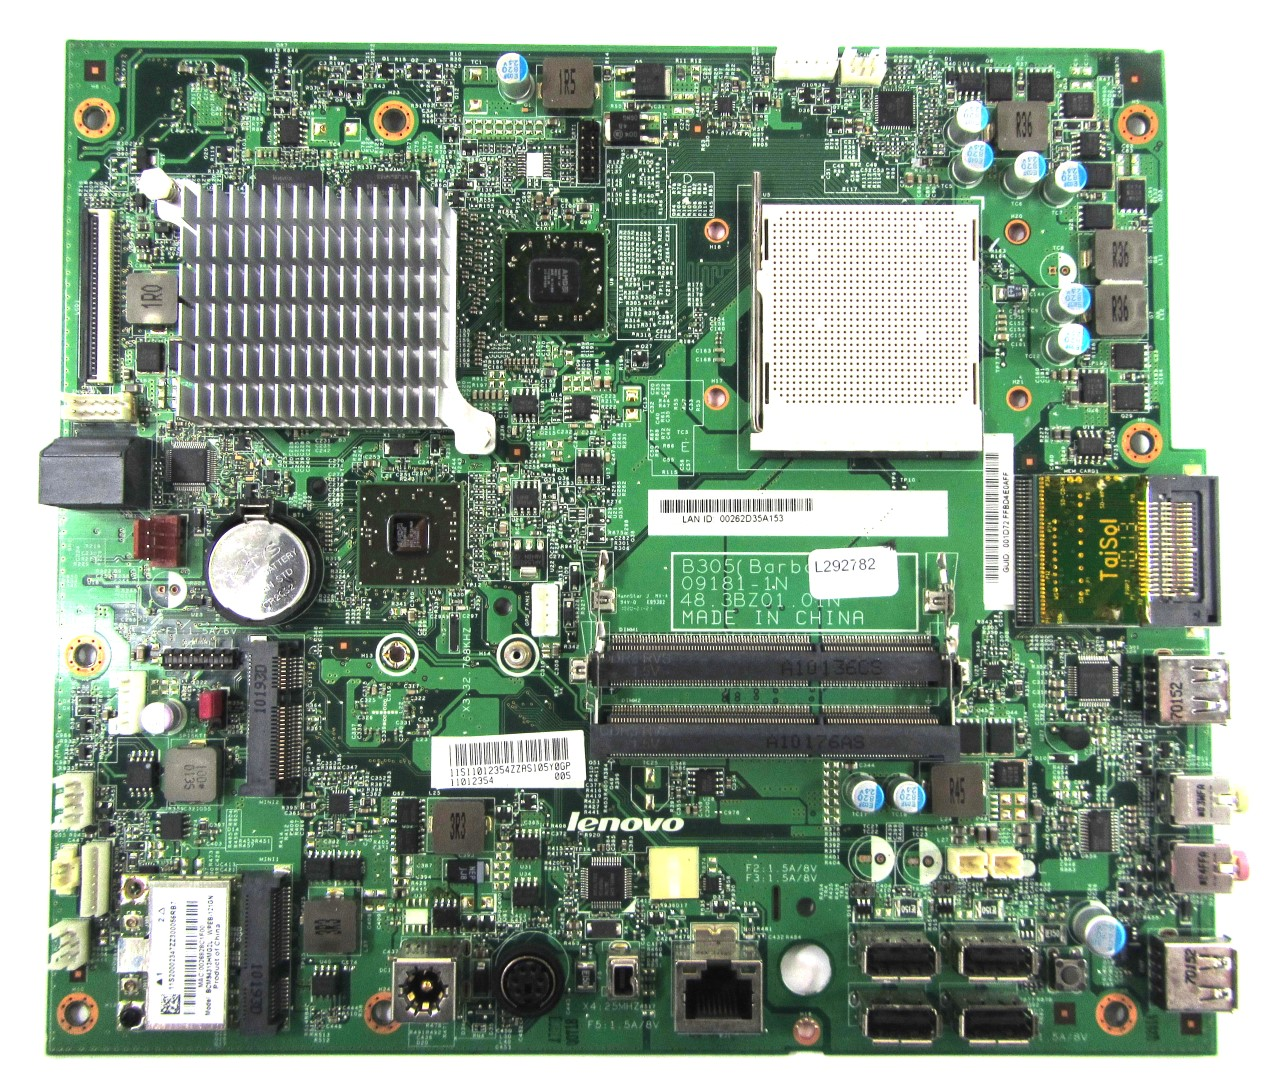 11012354 Lenovo IdeaCentre B305 (Socket AM2) Motherboard - Barbados